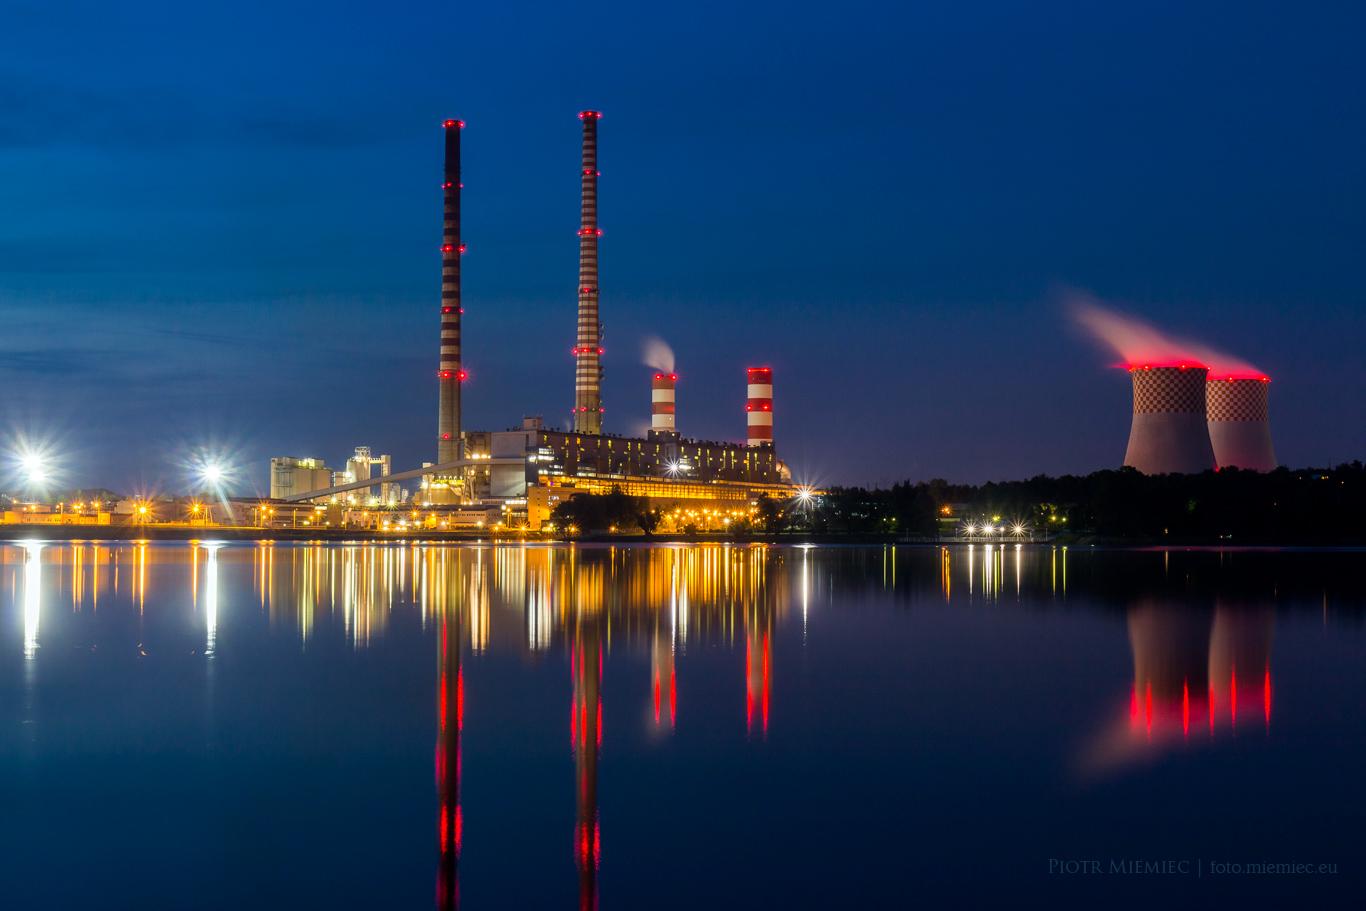 Elektrownia Rybnik IMG_7367